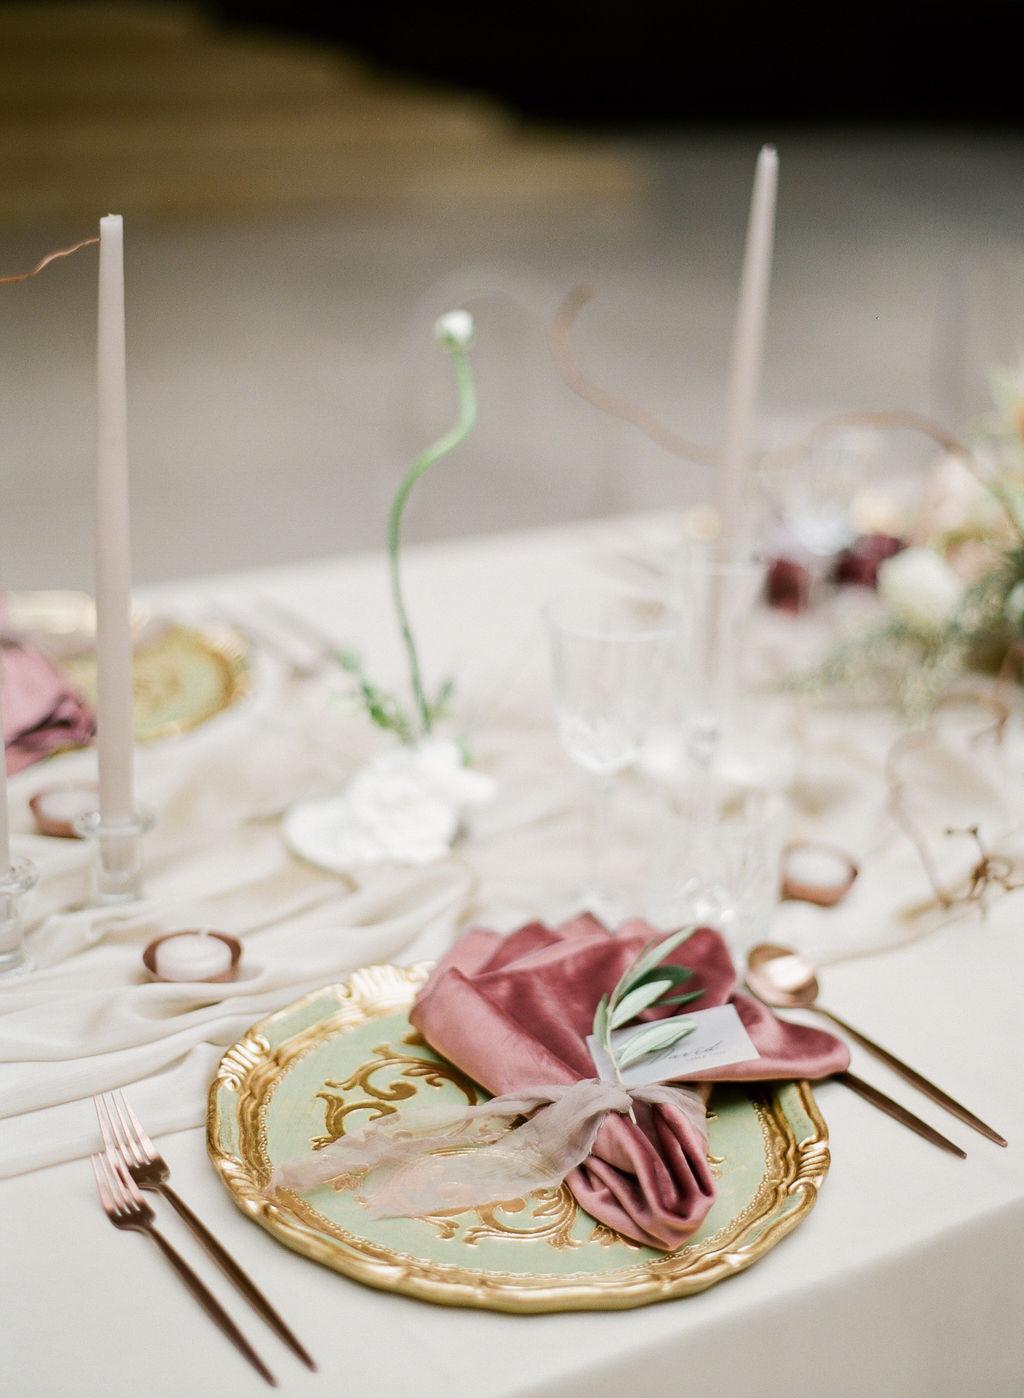 artiese-ago-wedding-editorial-000423610005.jpg